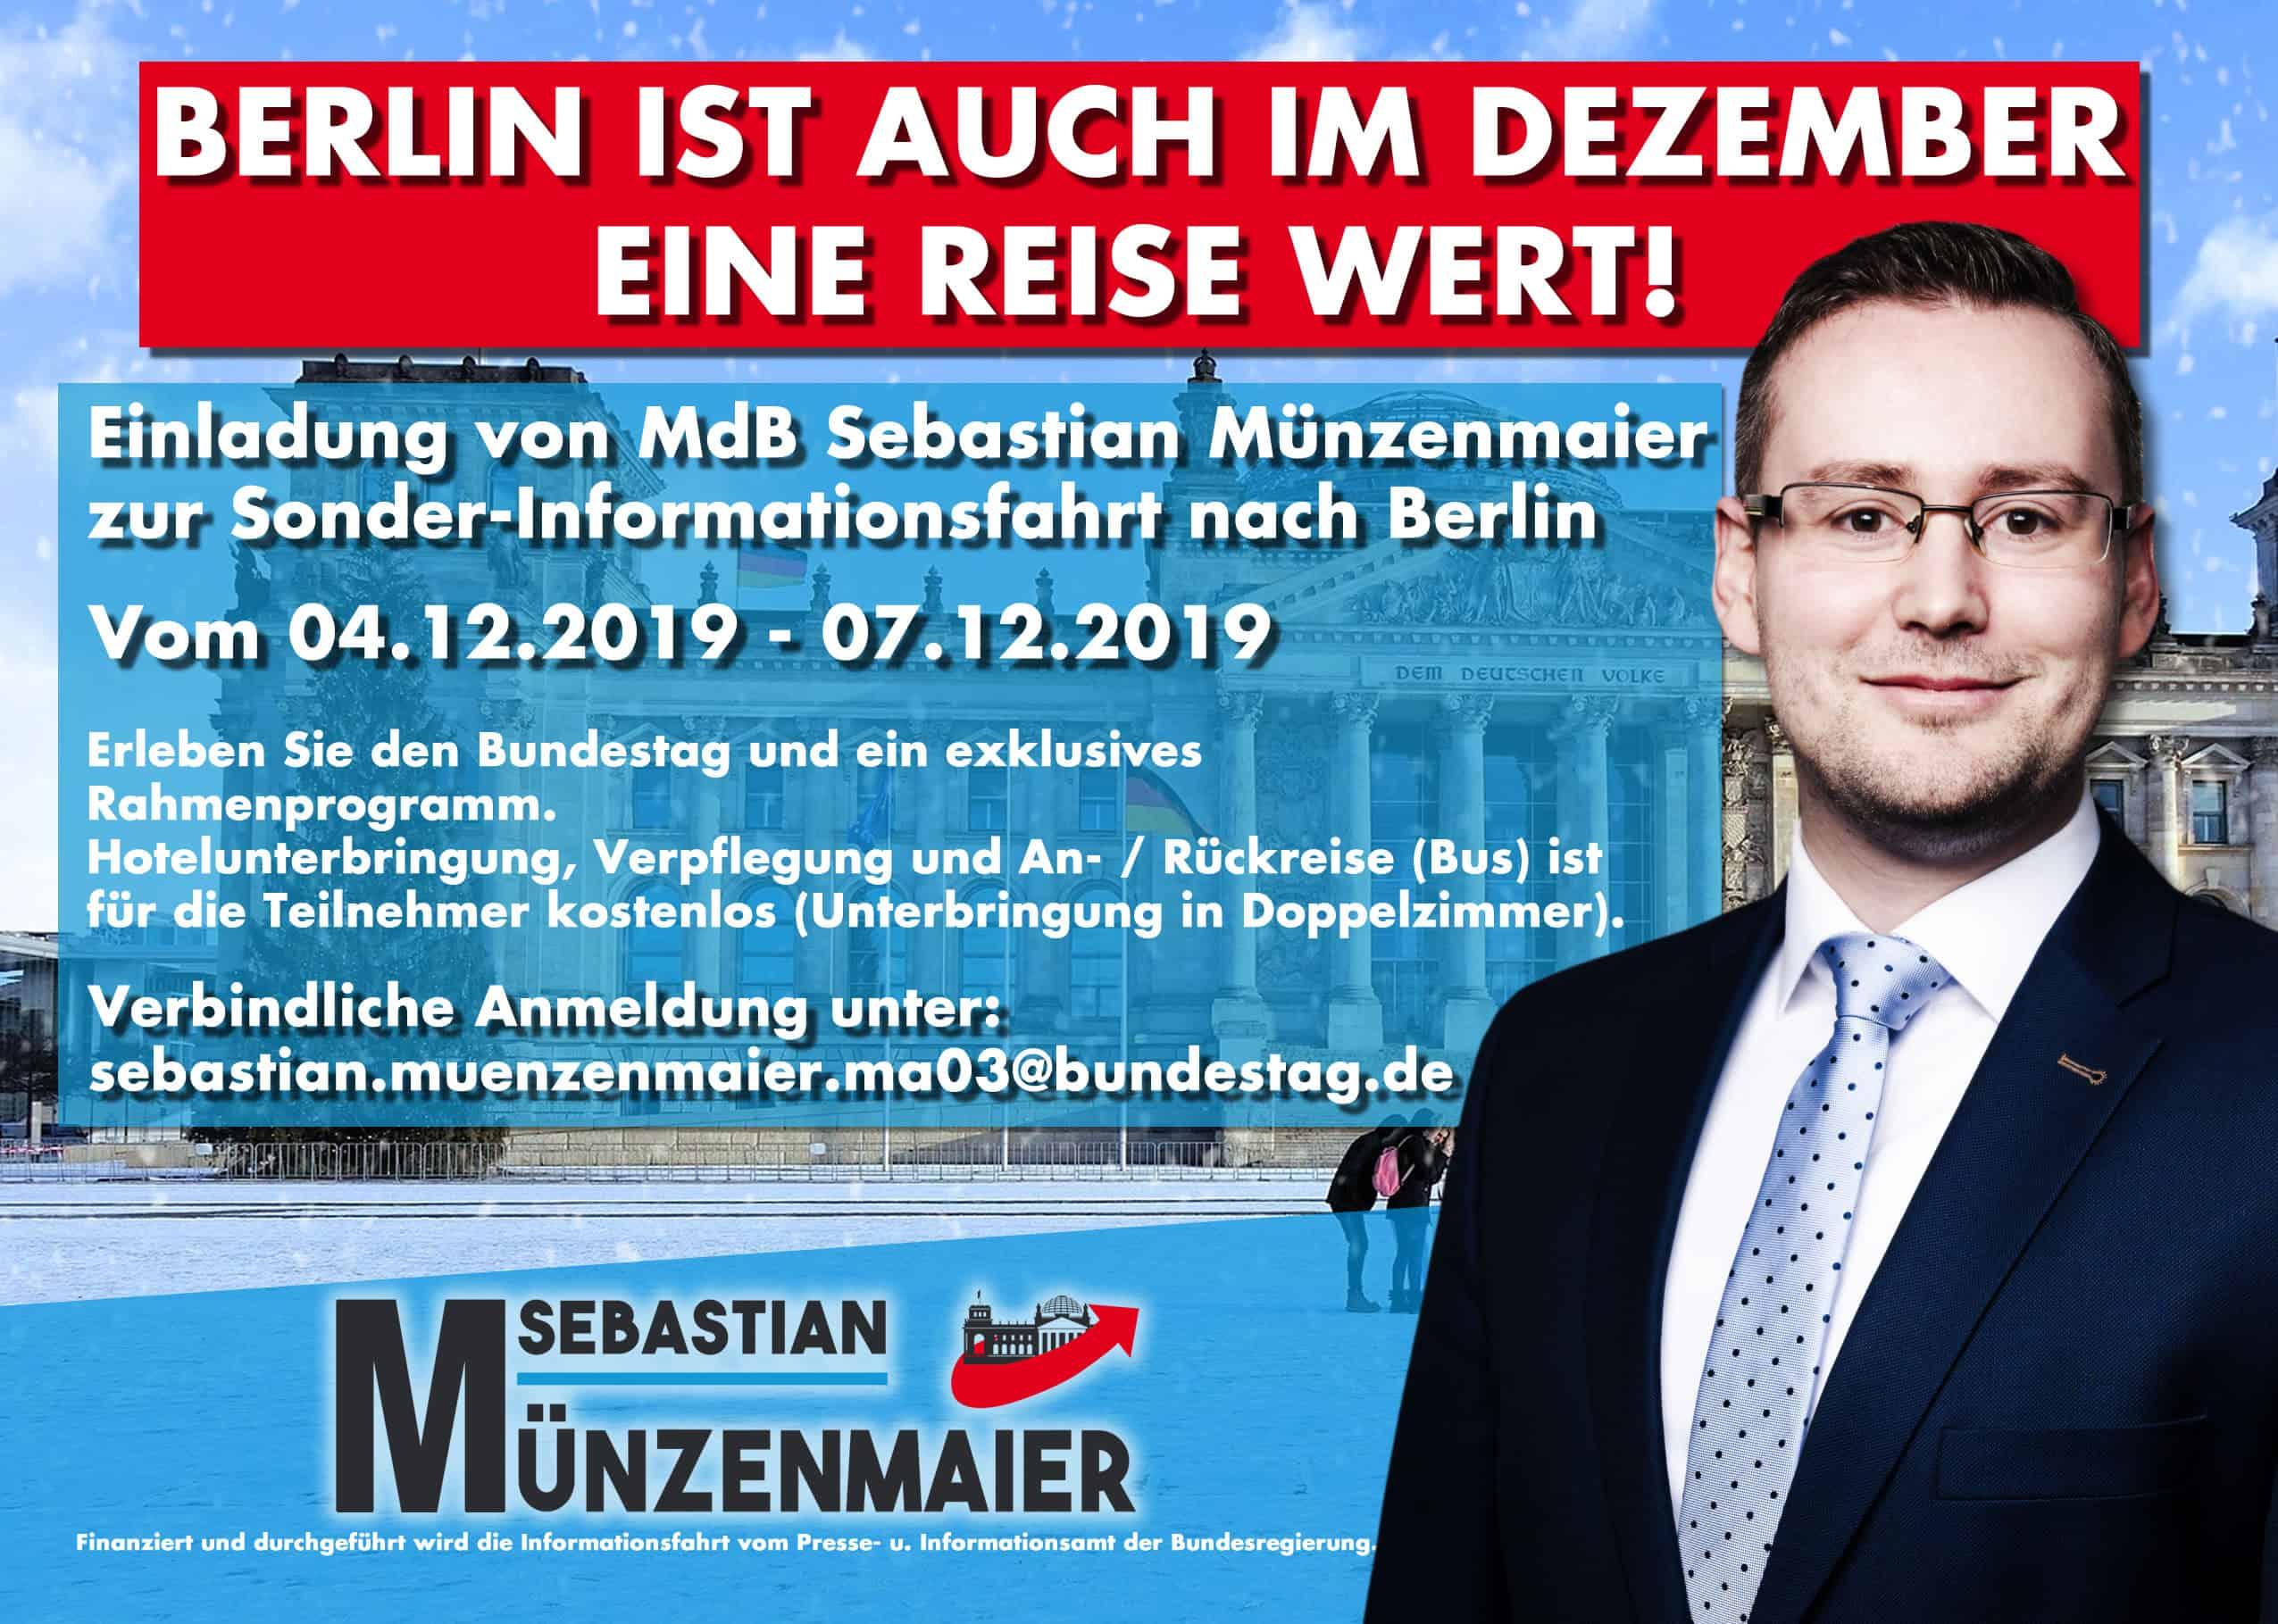 Münzenmaier, Besuch in Berlin im Dezember 2019